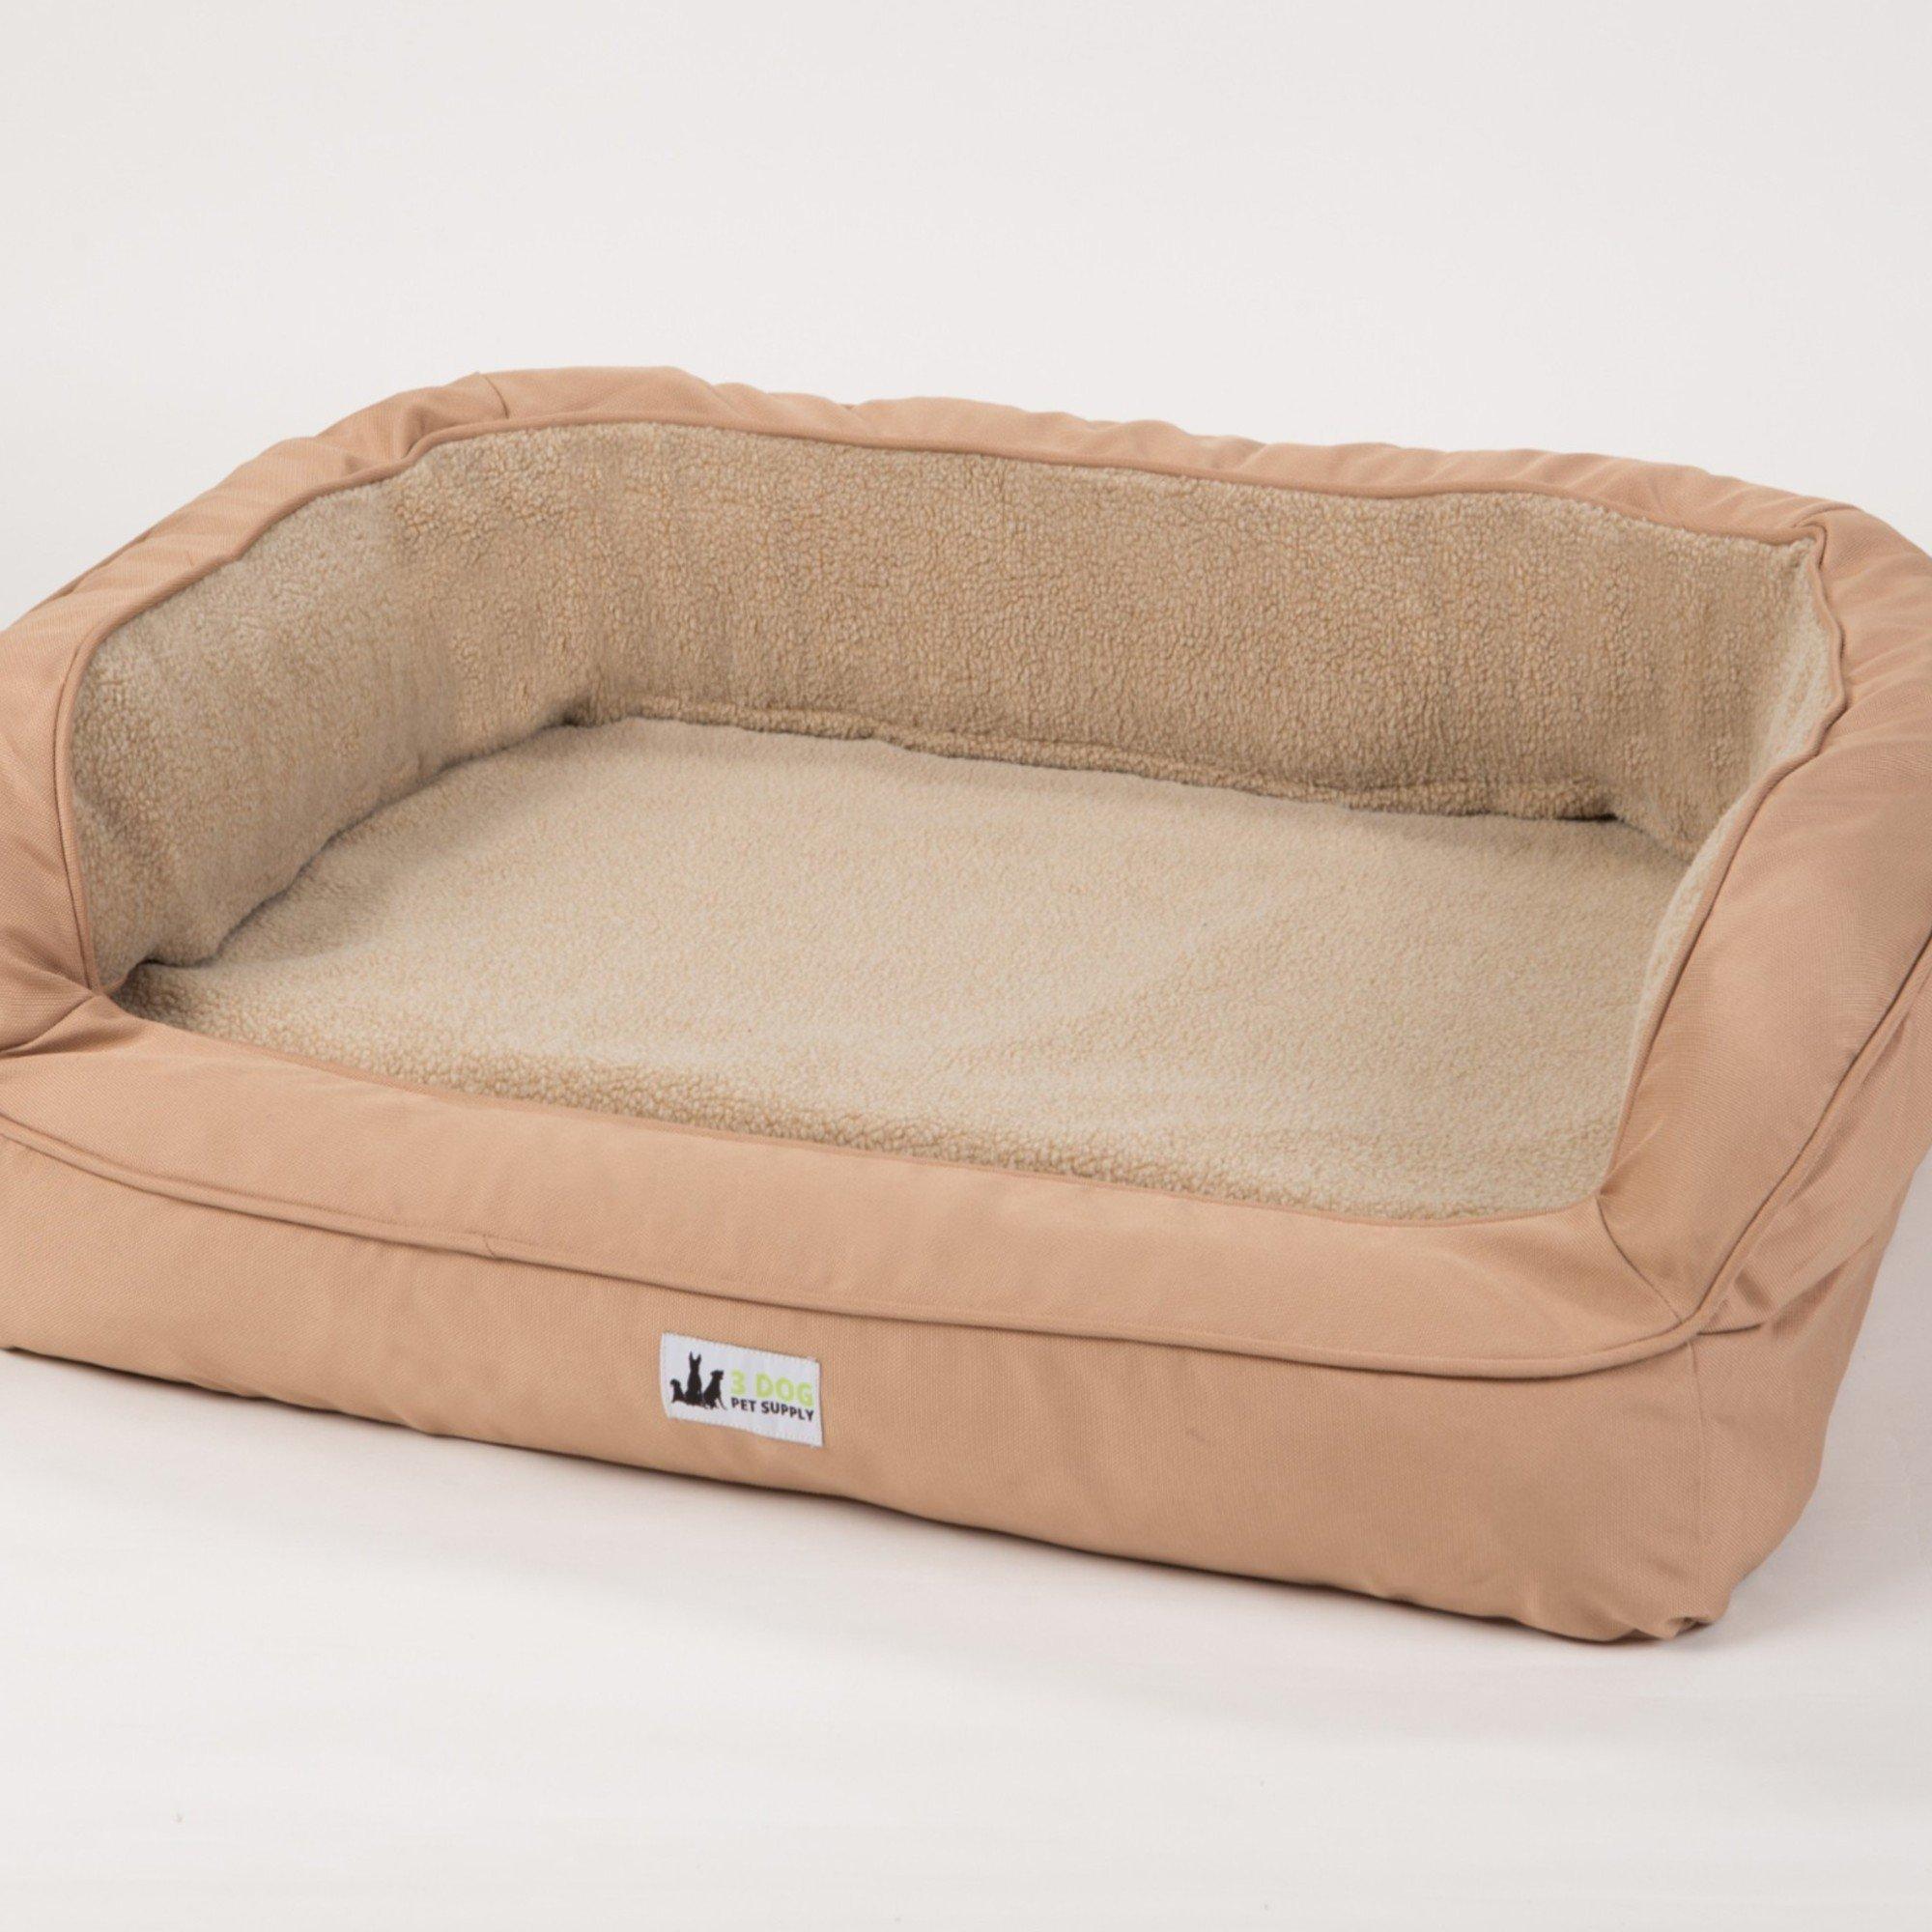 "3 Dog EZ Wash Fleece Bolster Tan Dog Bed, 48"" L X 31"" W X 10"" H, Large"